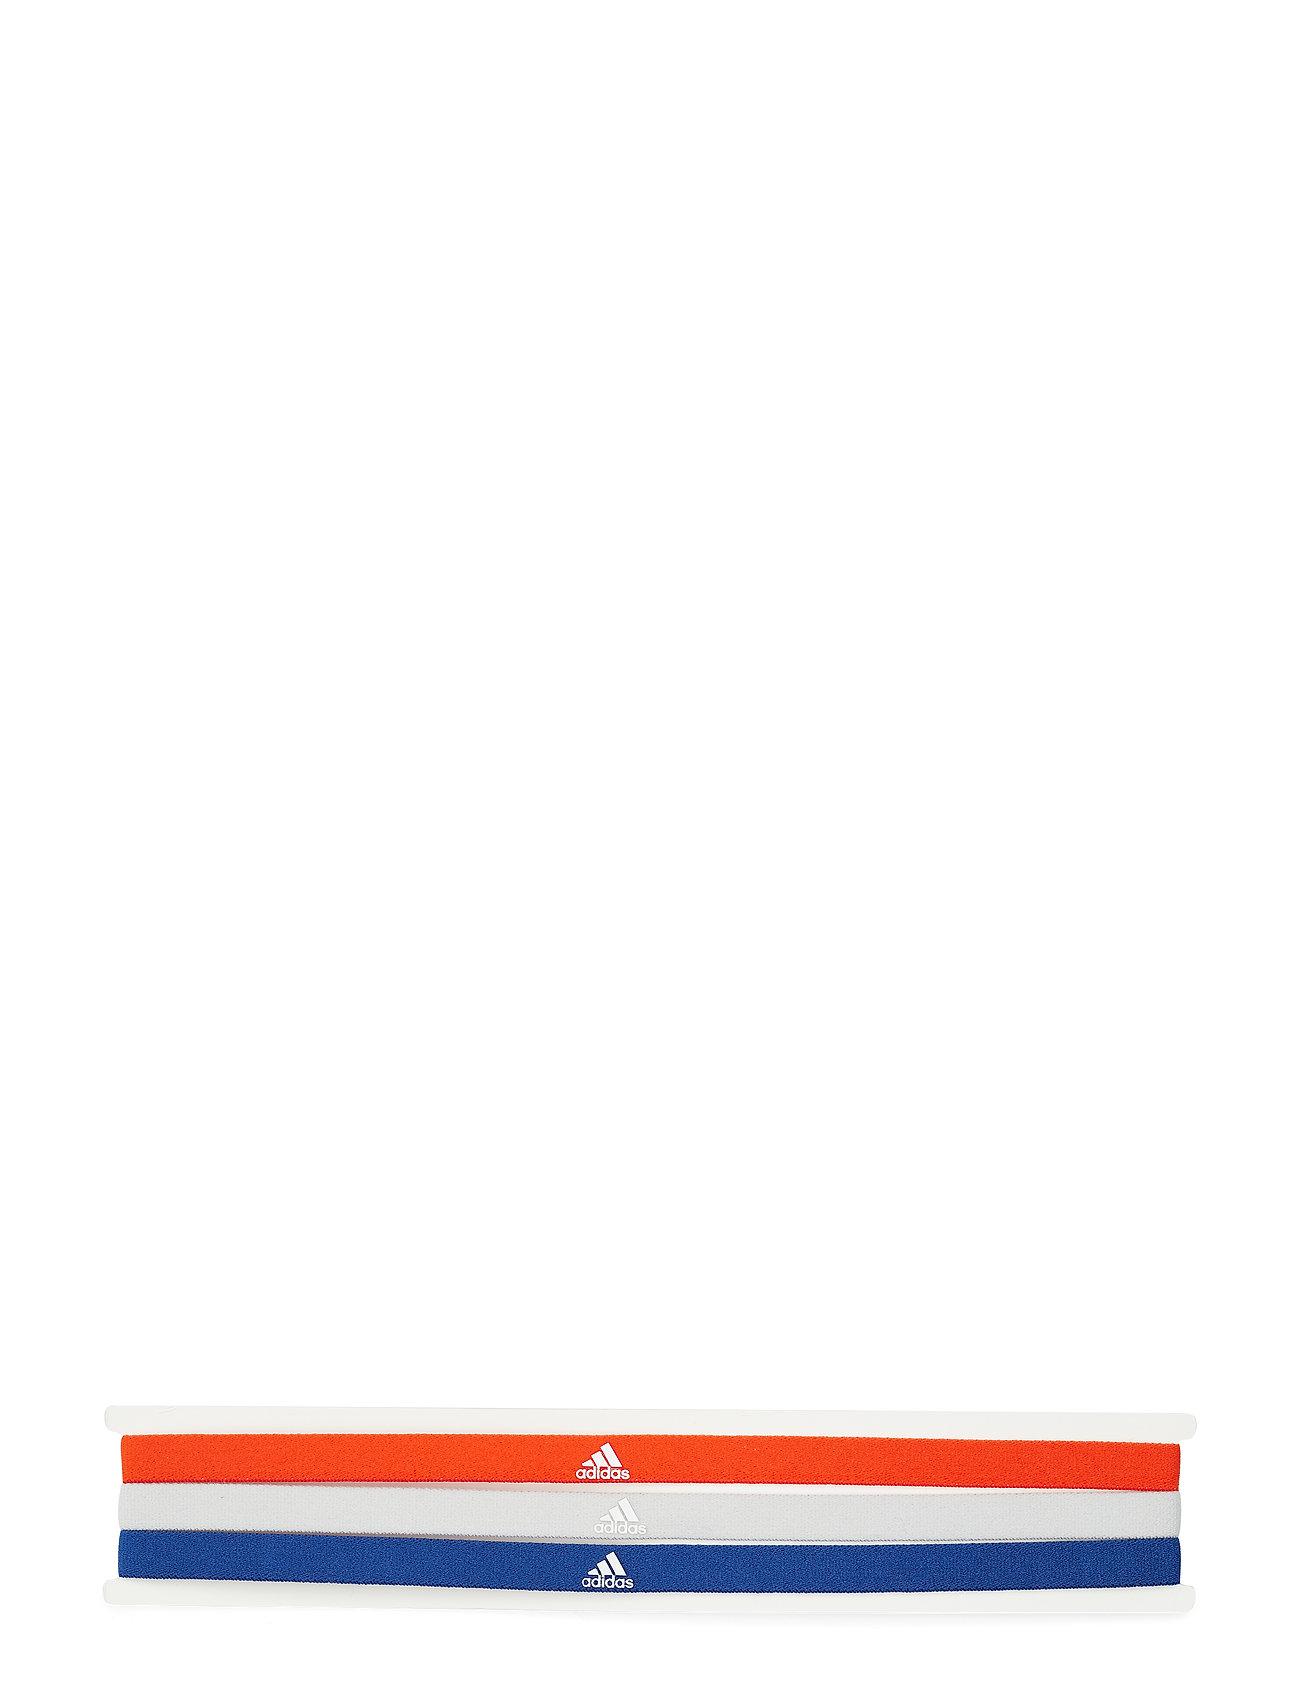 Image of 3pp Hairband Hårtilbehør Multi/mønstret Adidas Performance (3191339705)